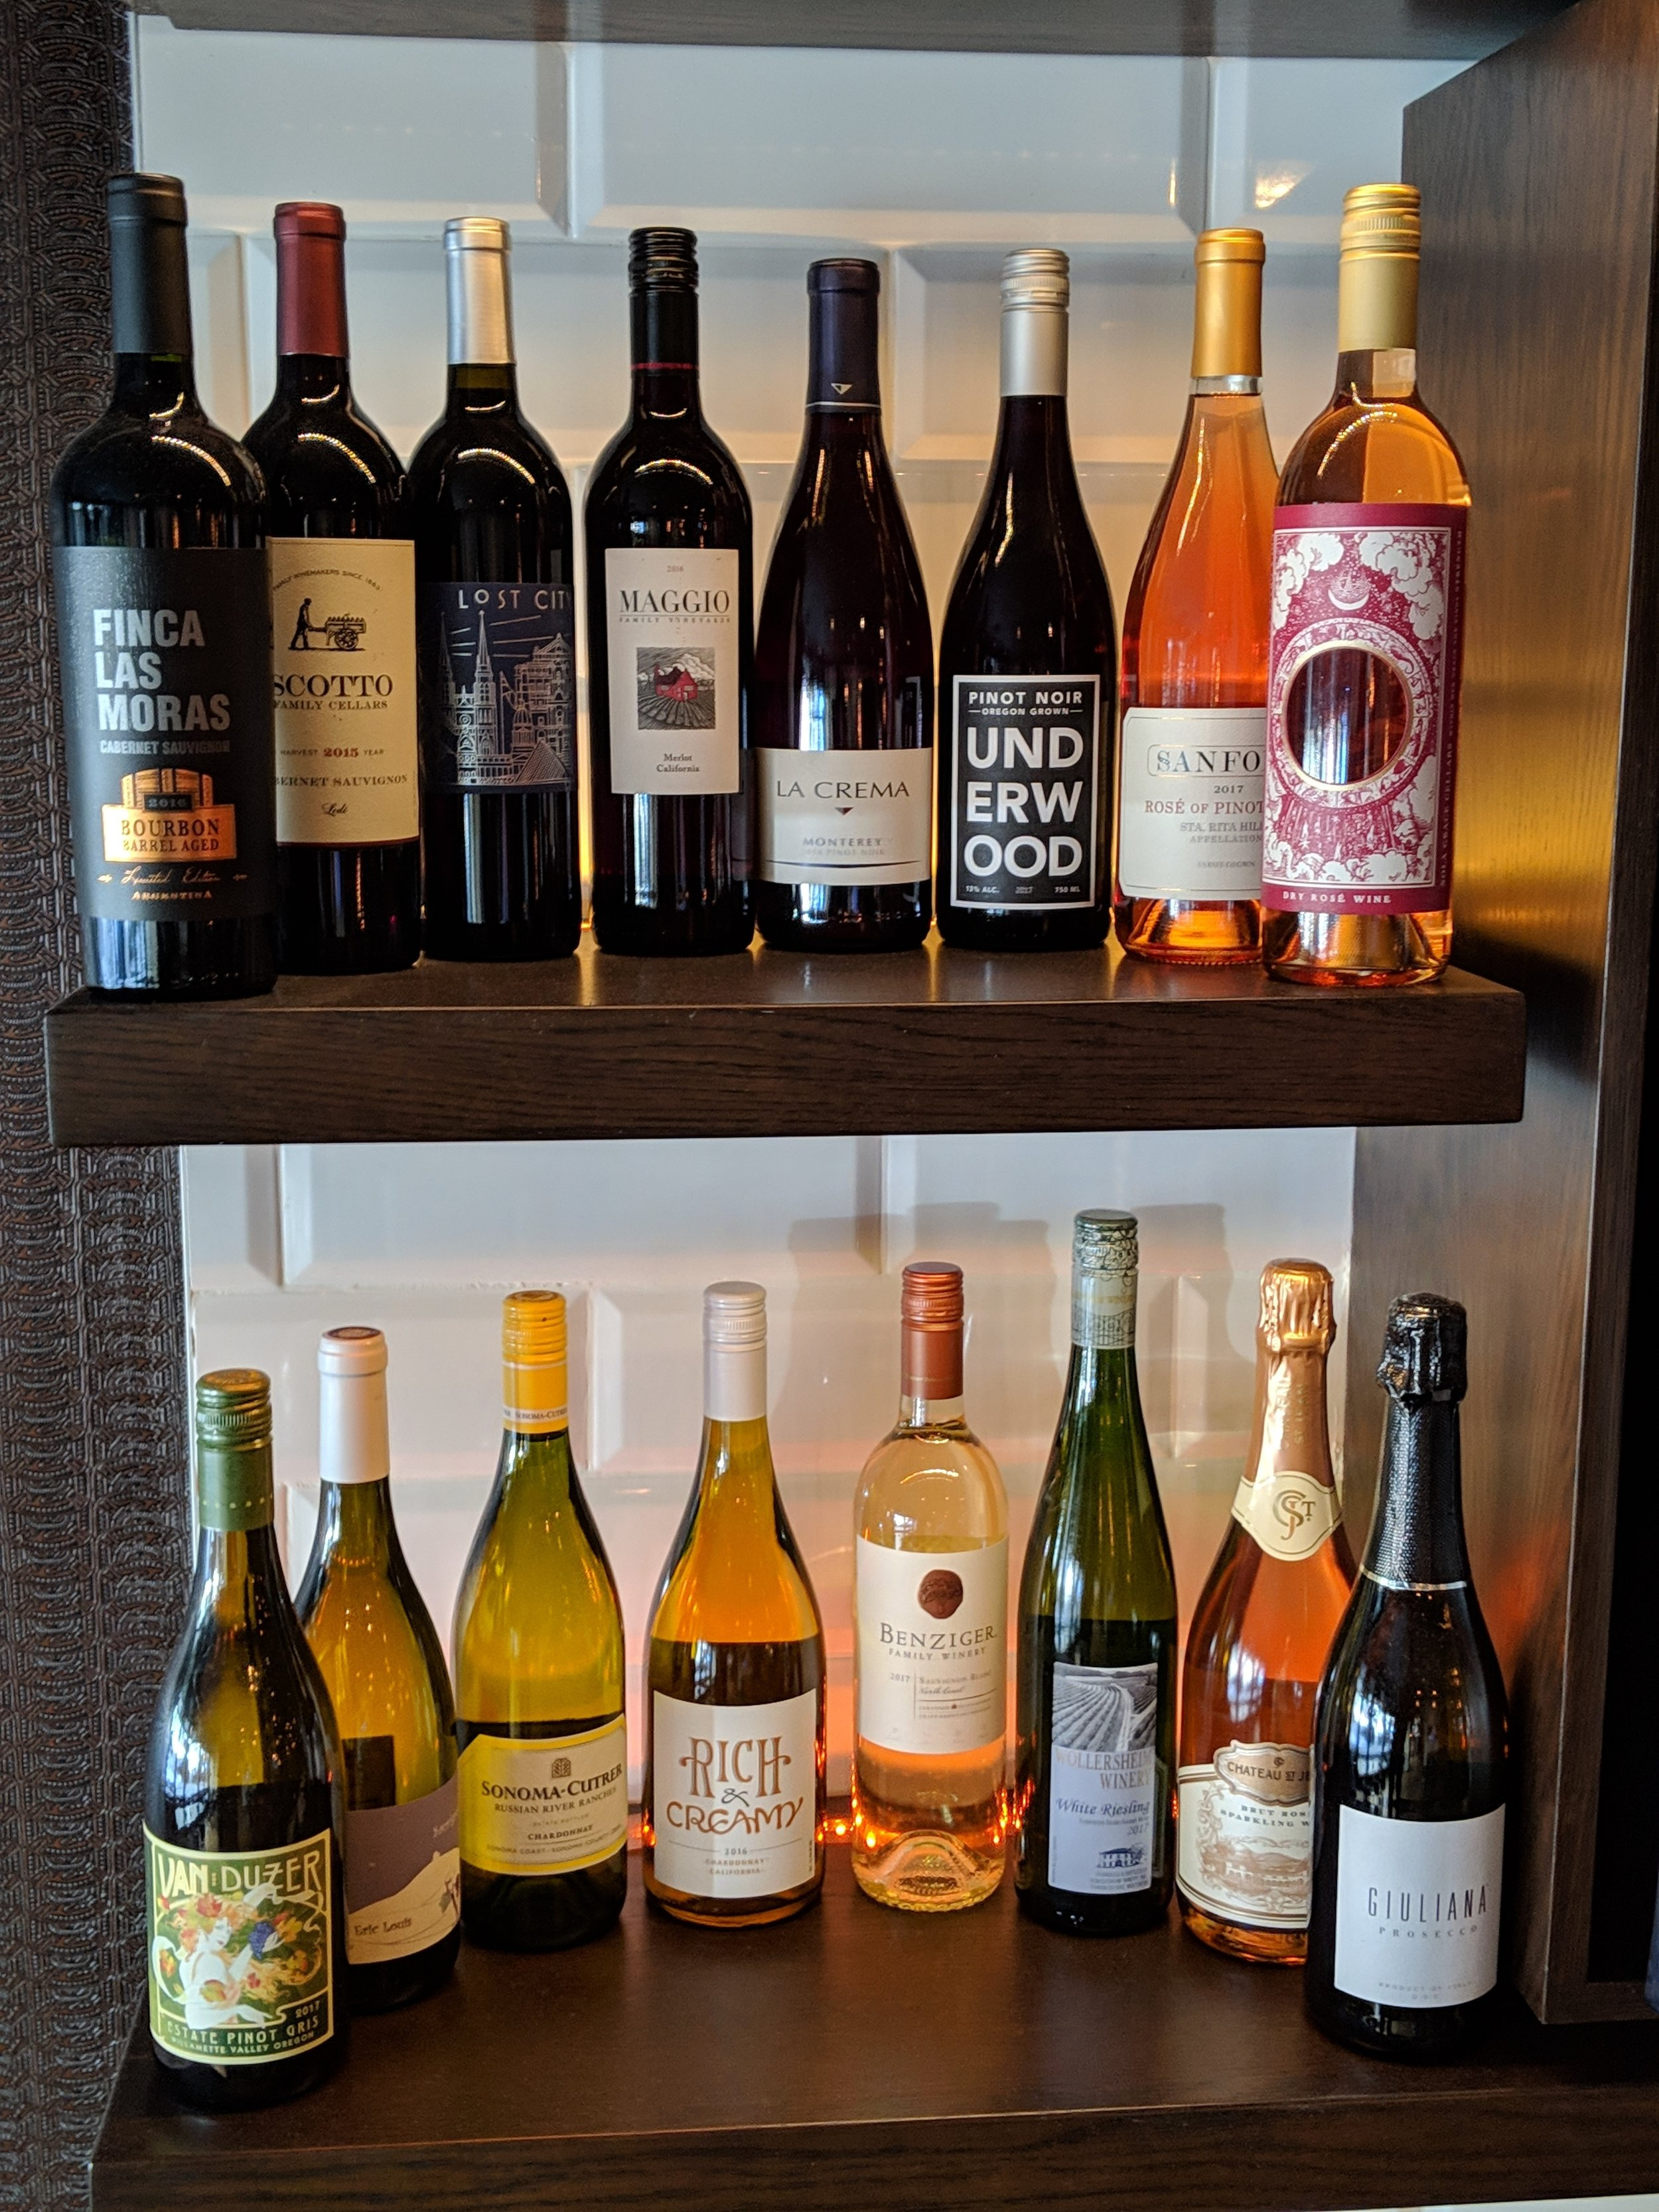 Special Wine Deals on Mondays